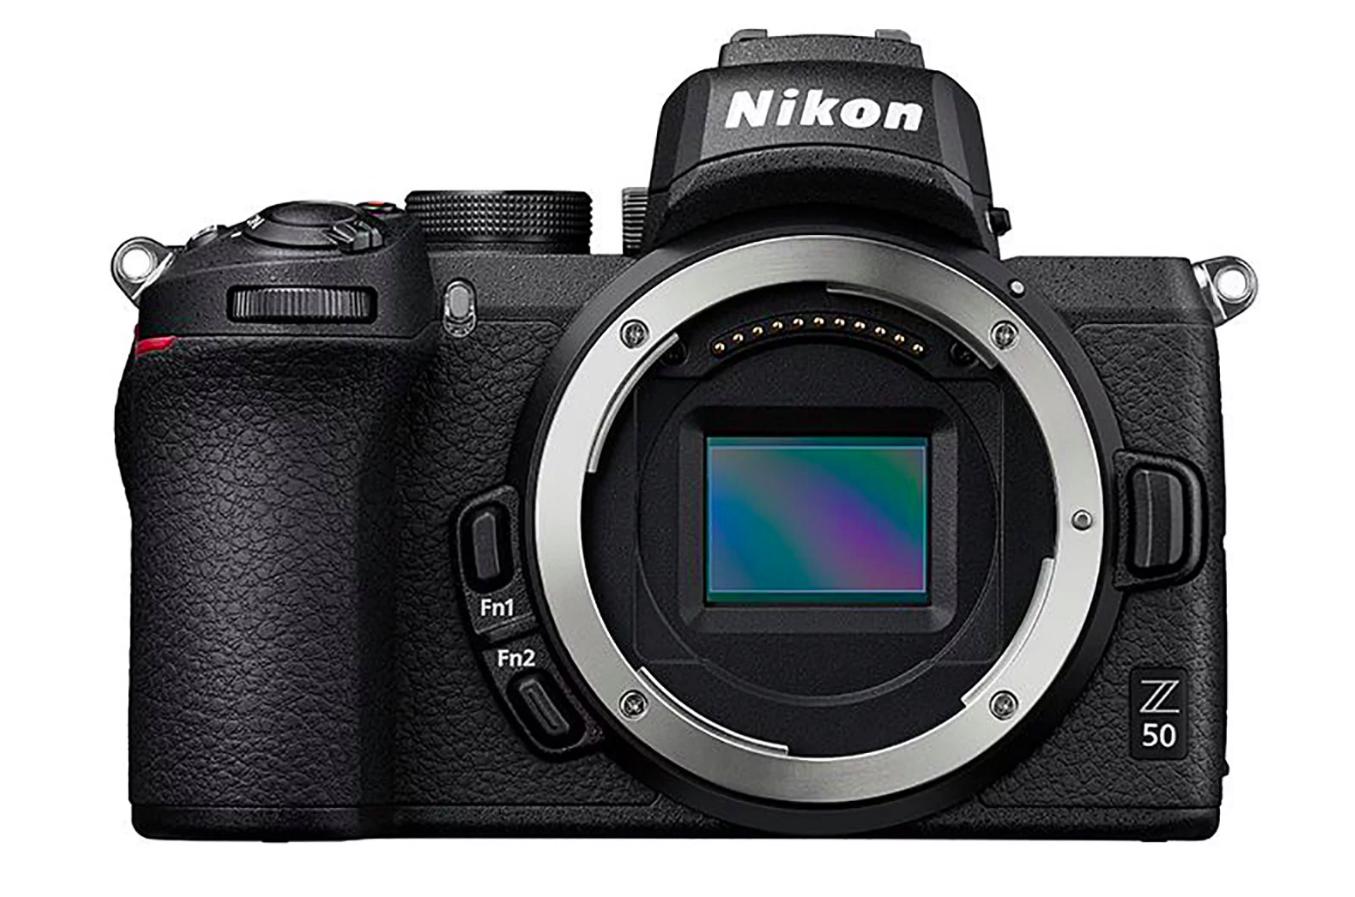 Nikonu Z50